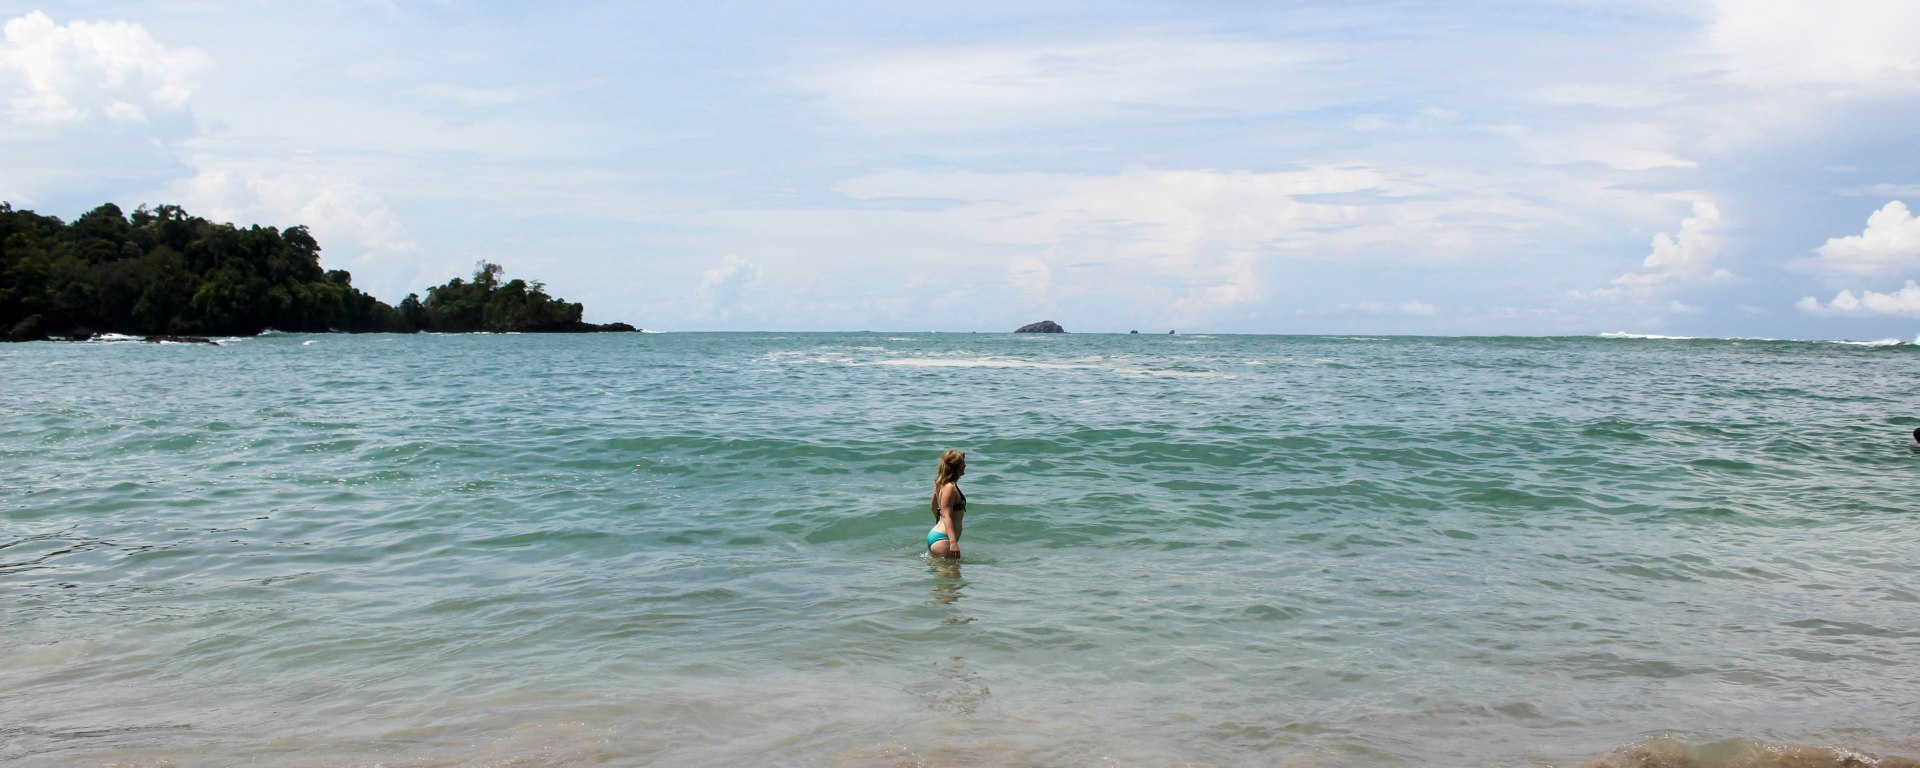 Nicola in the sea at the beach in Manuel Antonio National Park